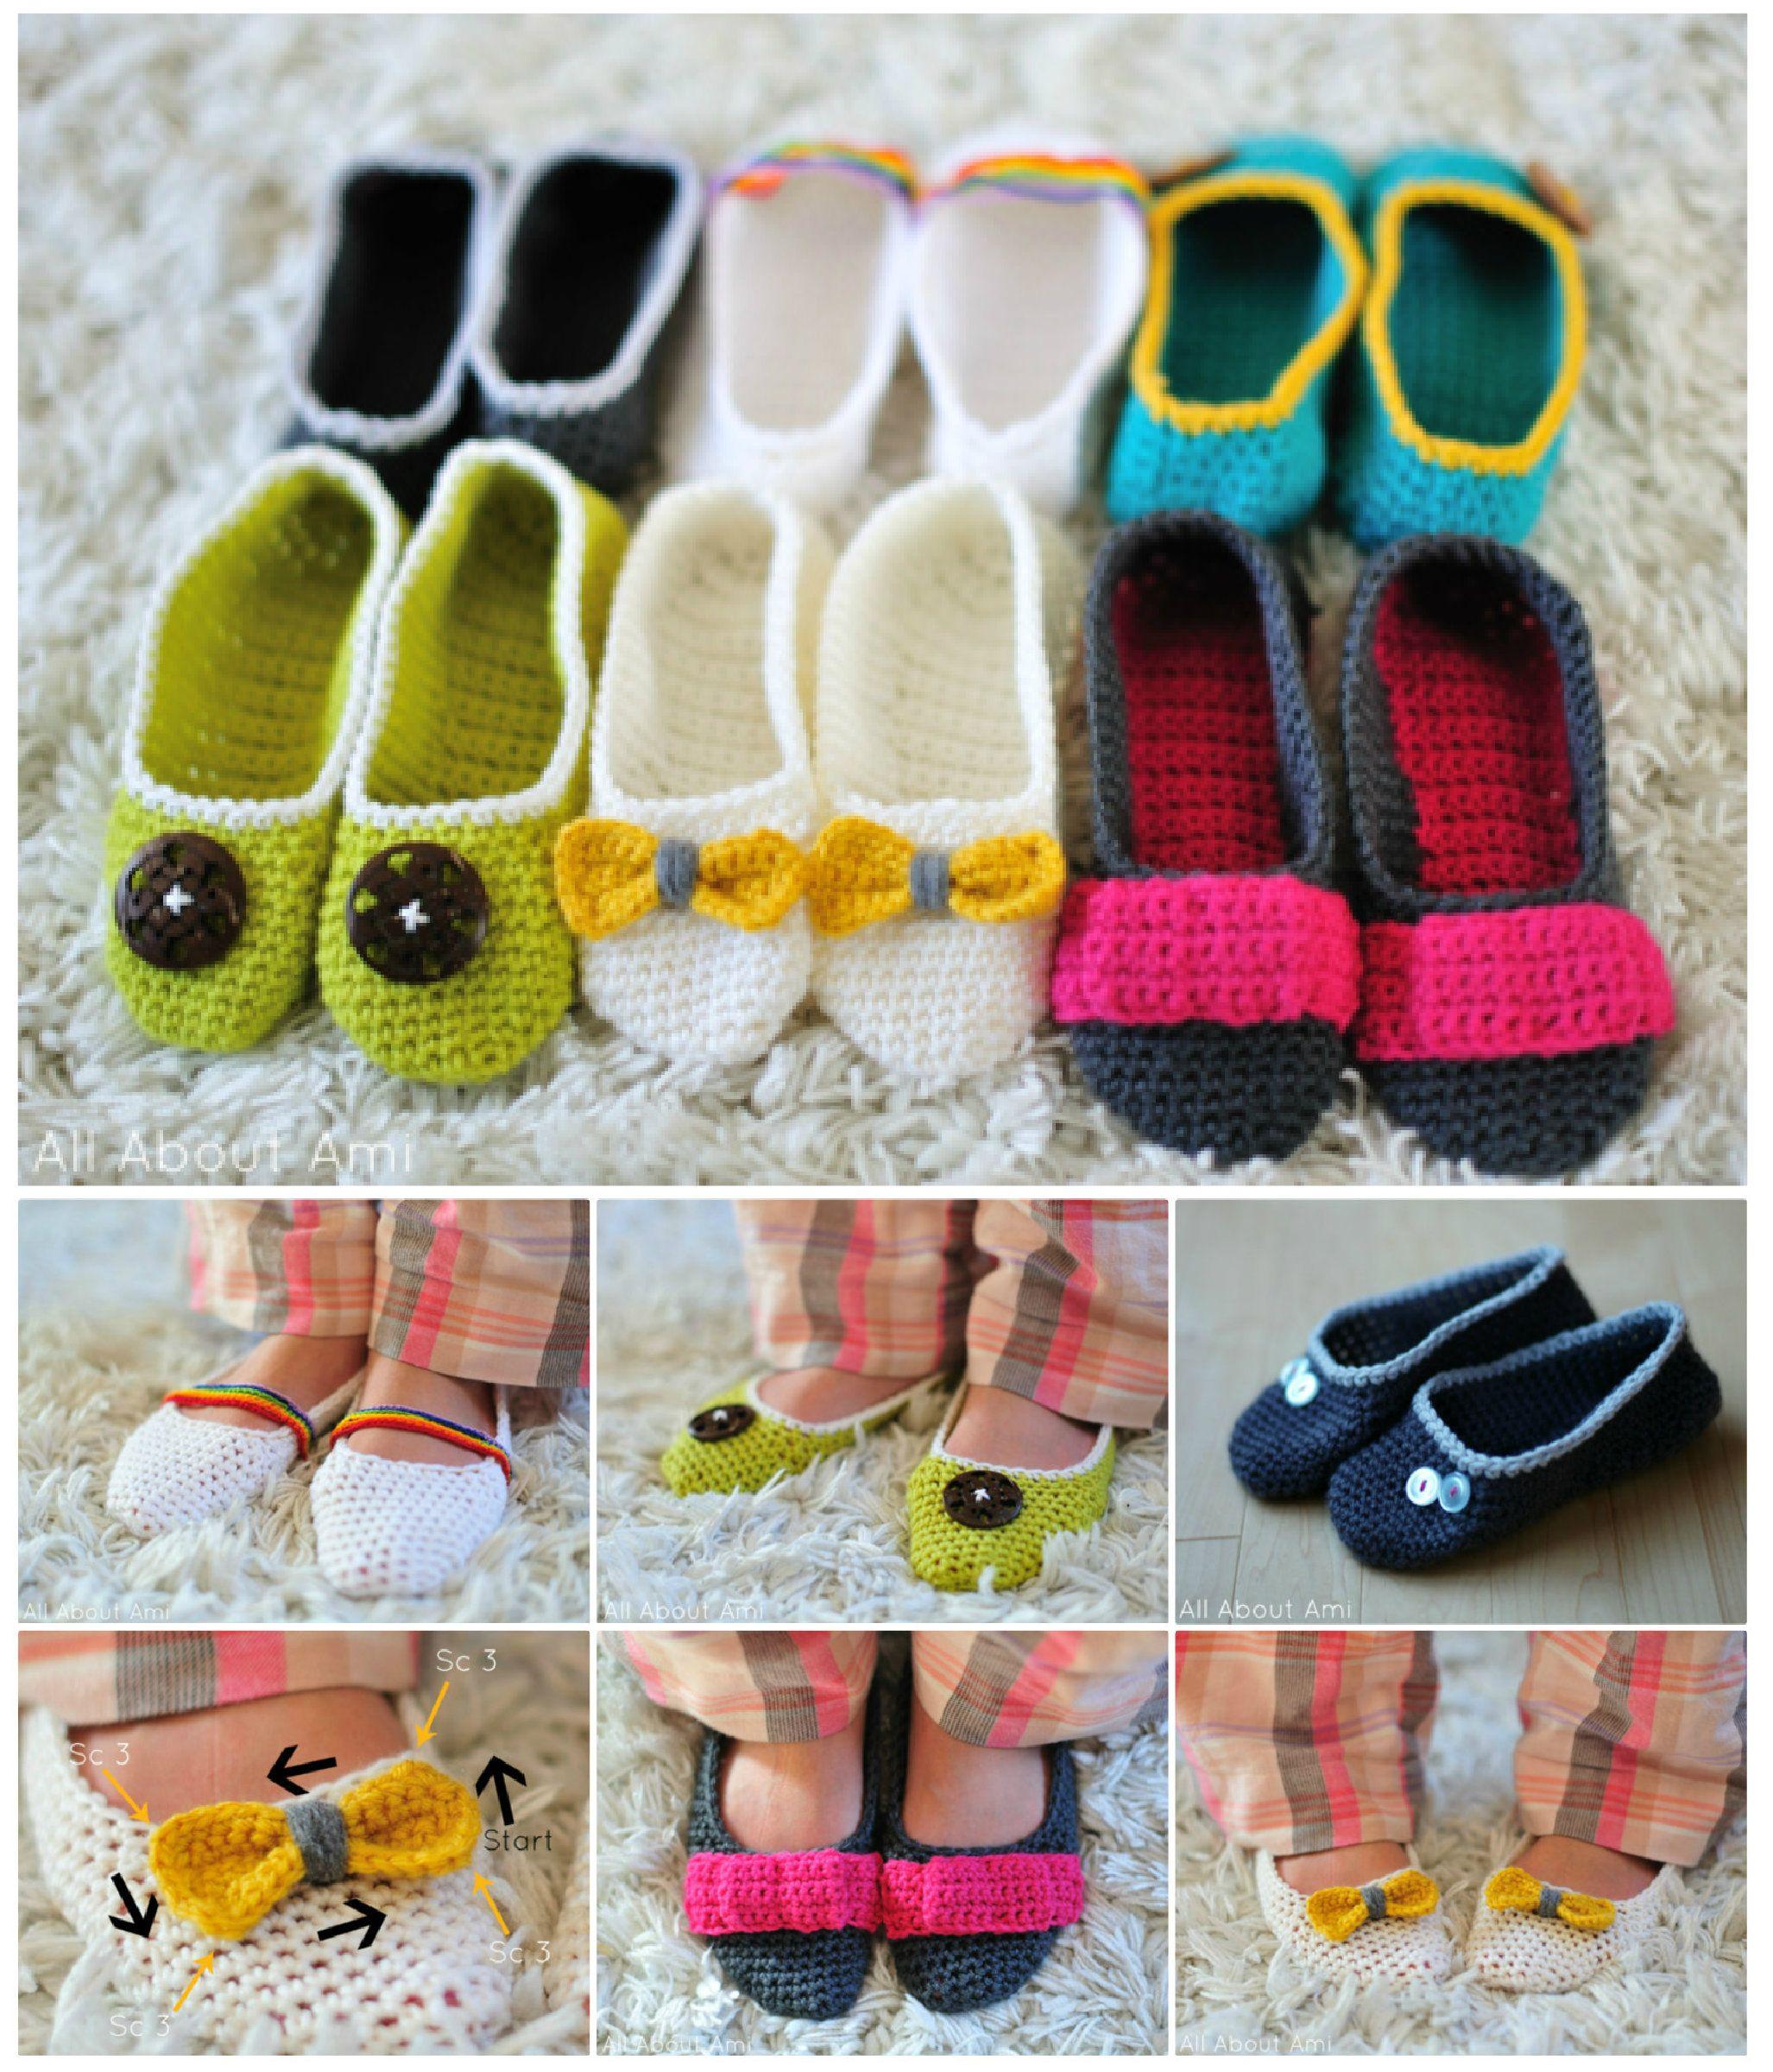 Crochet Slippers - FREE Patterns